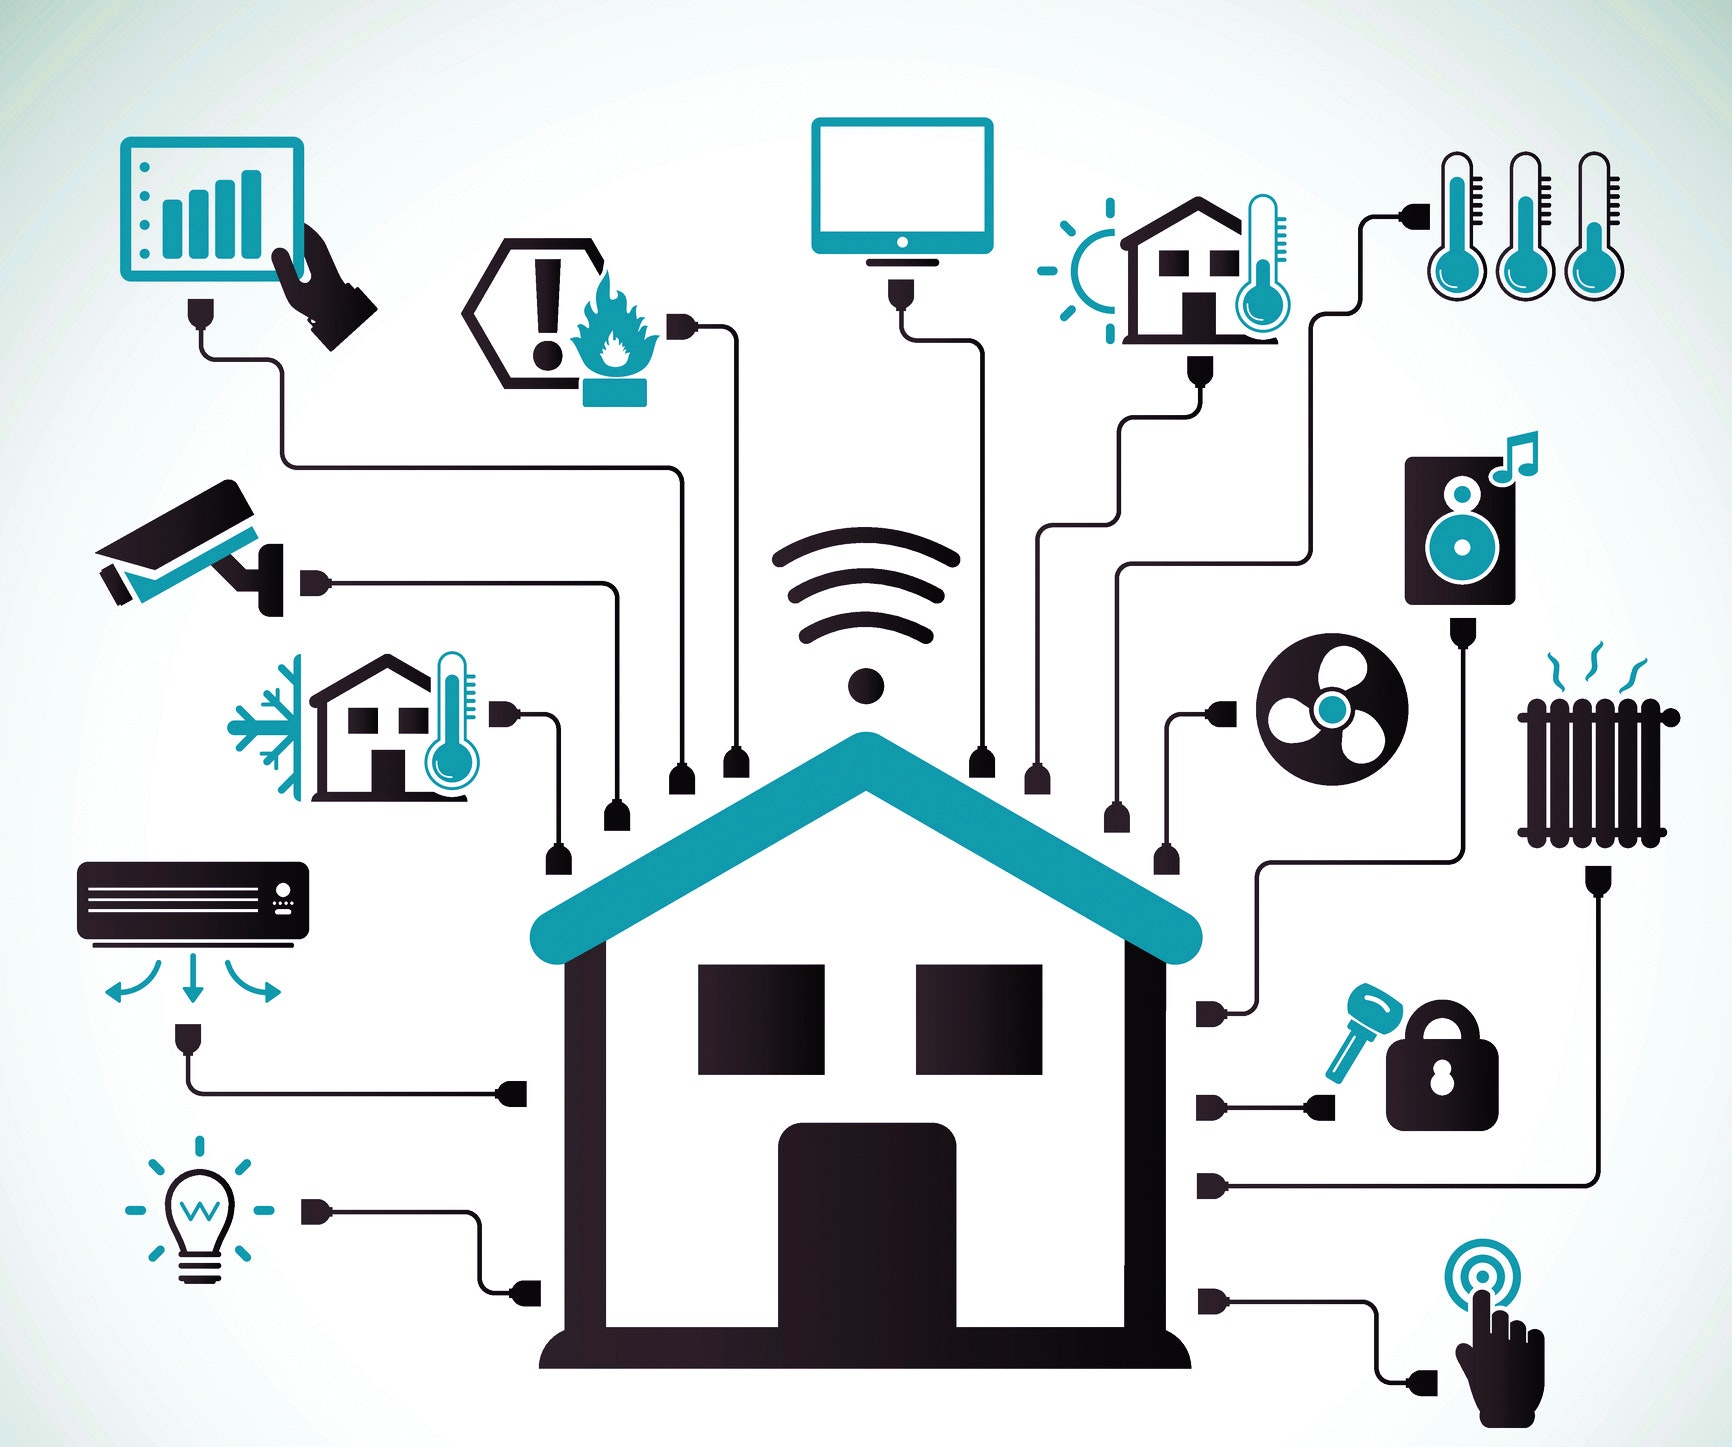 Smart Home Movement Follows Consumer Demand